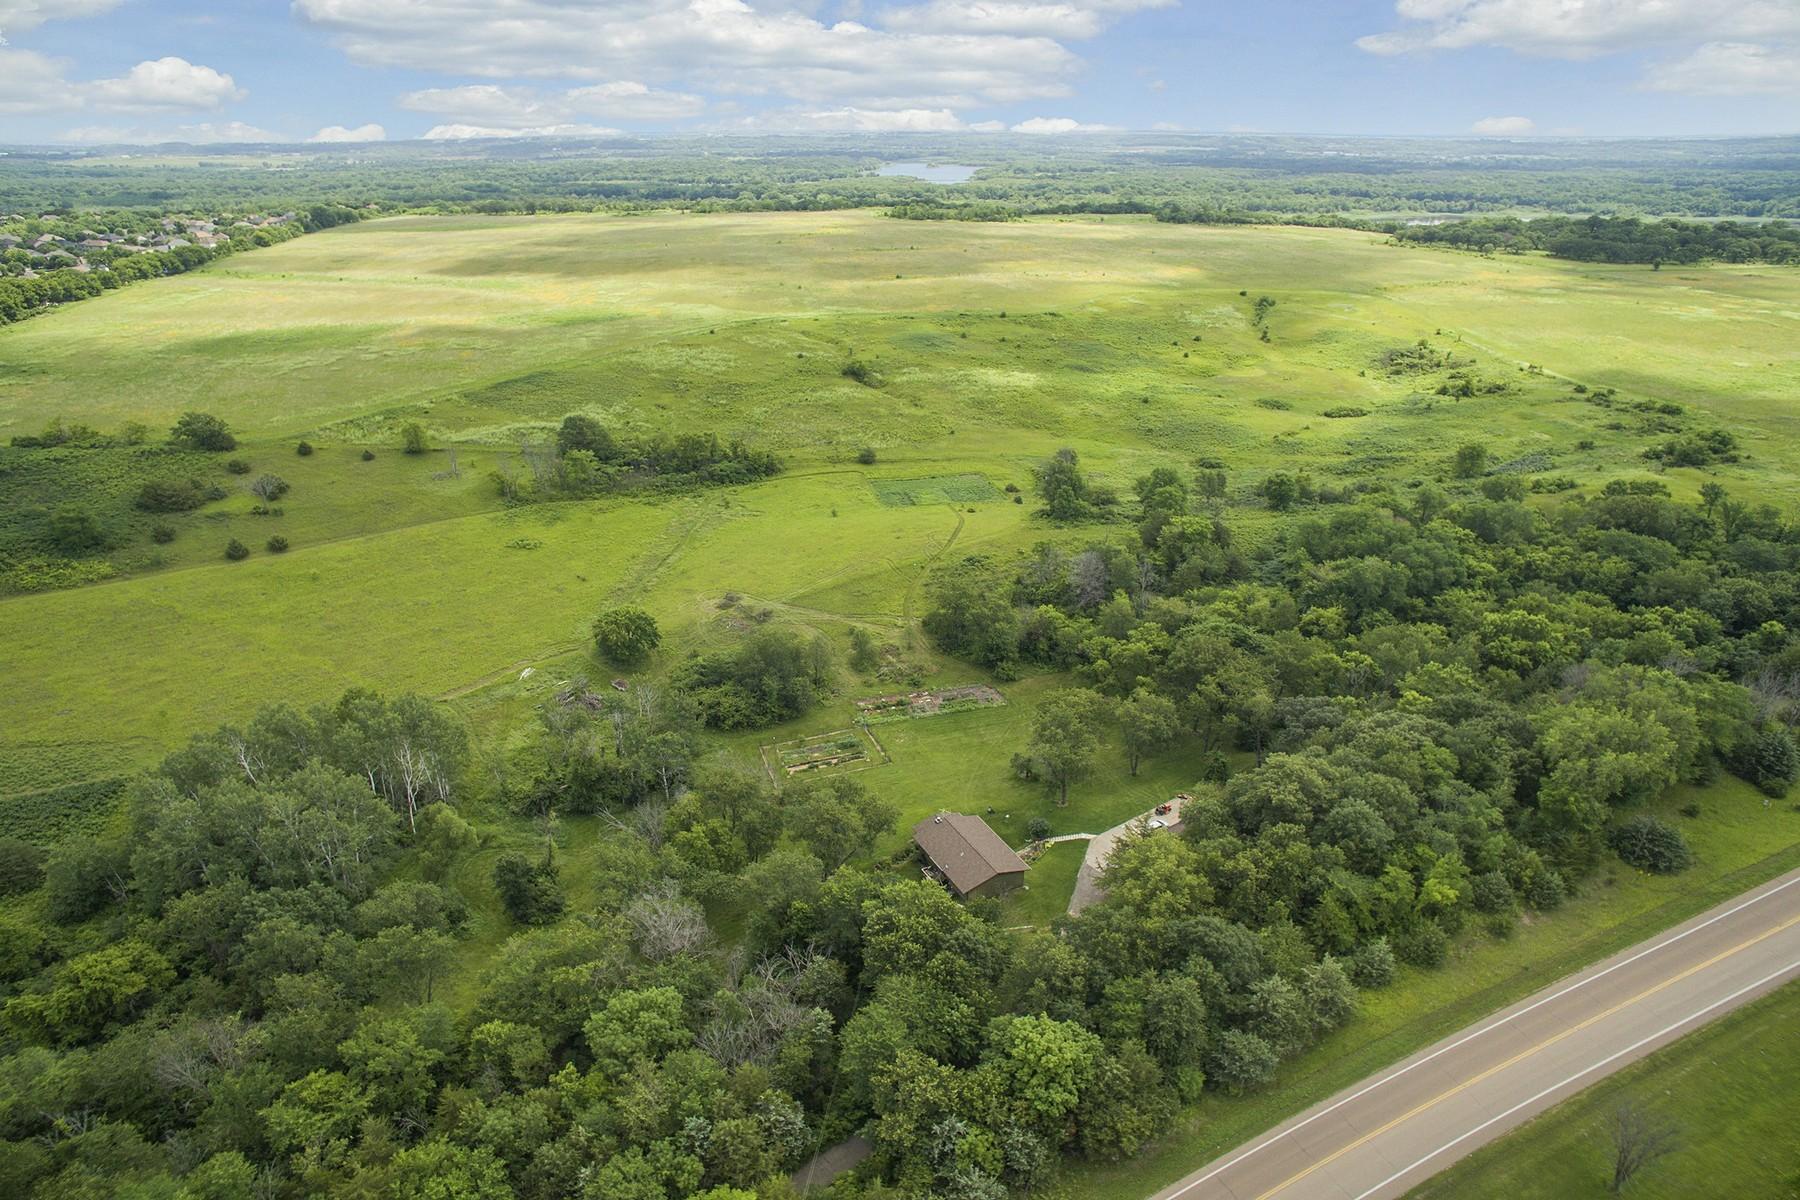 Land for Sale at 14485 Jonathan Carver Parkway Carver, Minnesota 55315 United States